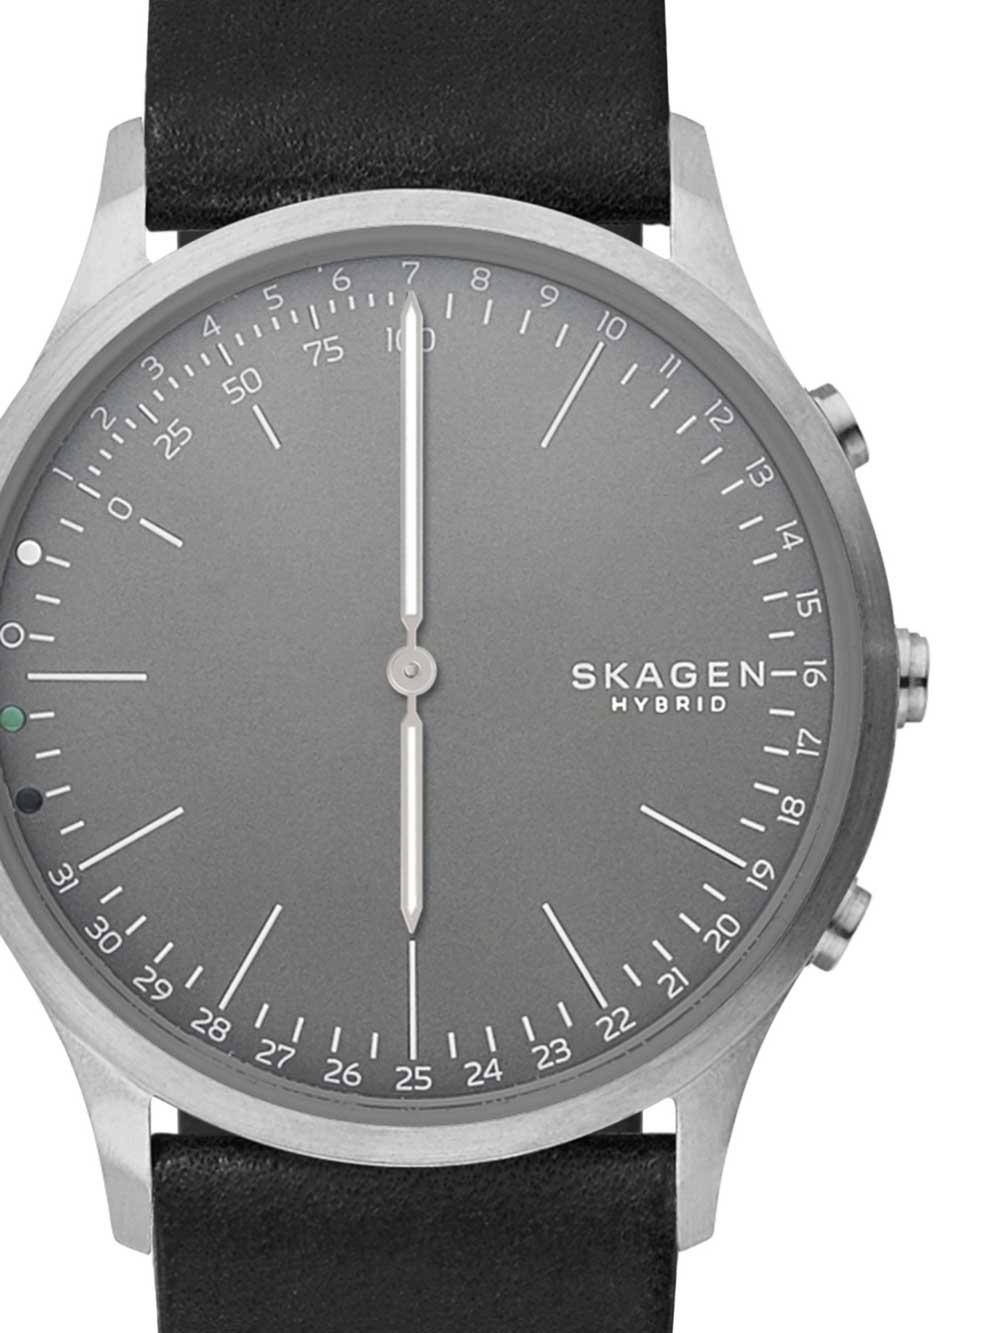 Skagen SKT1203 CA Jorn Gray I Hybrid Smartwatch Herren 42mm 3ATM